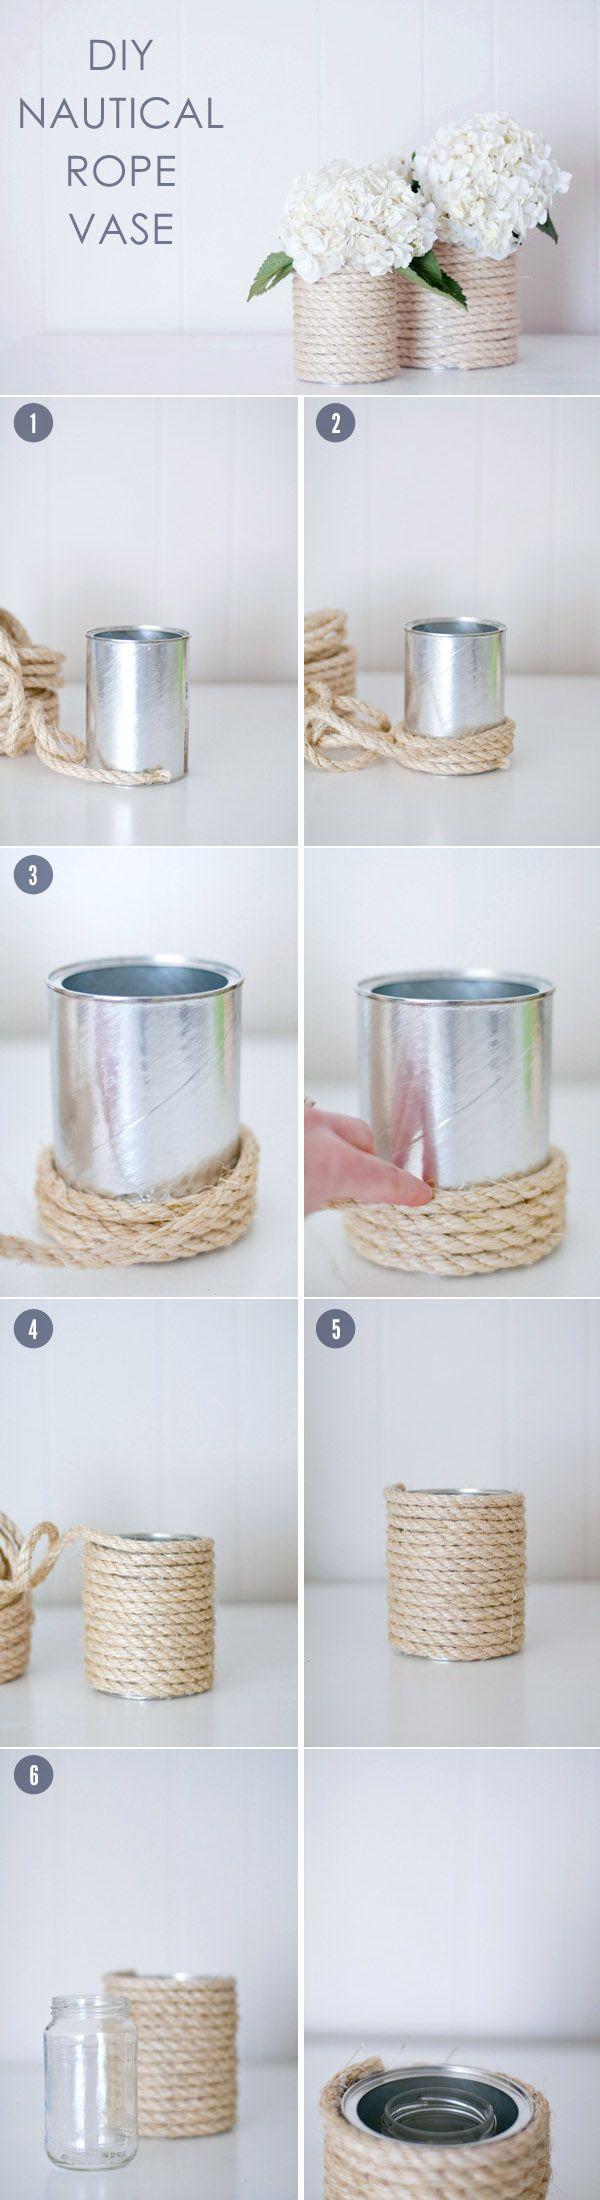 diy wedding flowers centerpiece ideas with nautical rope vases